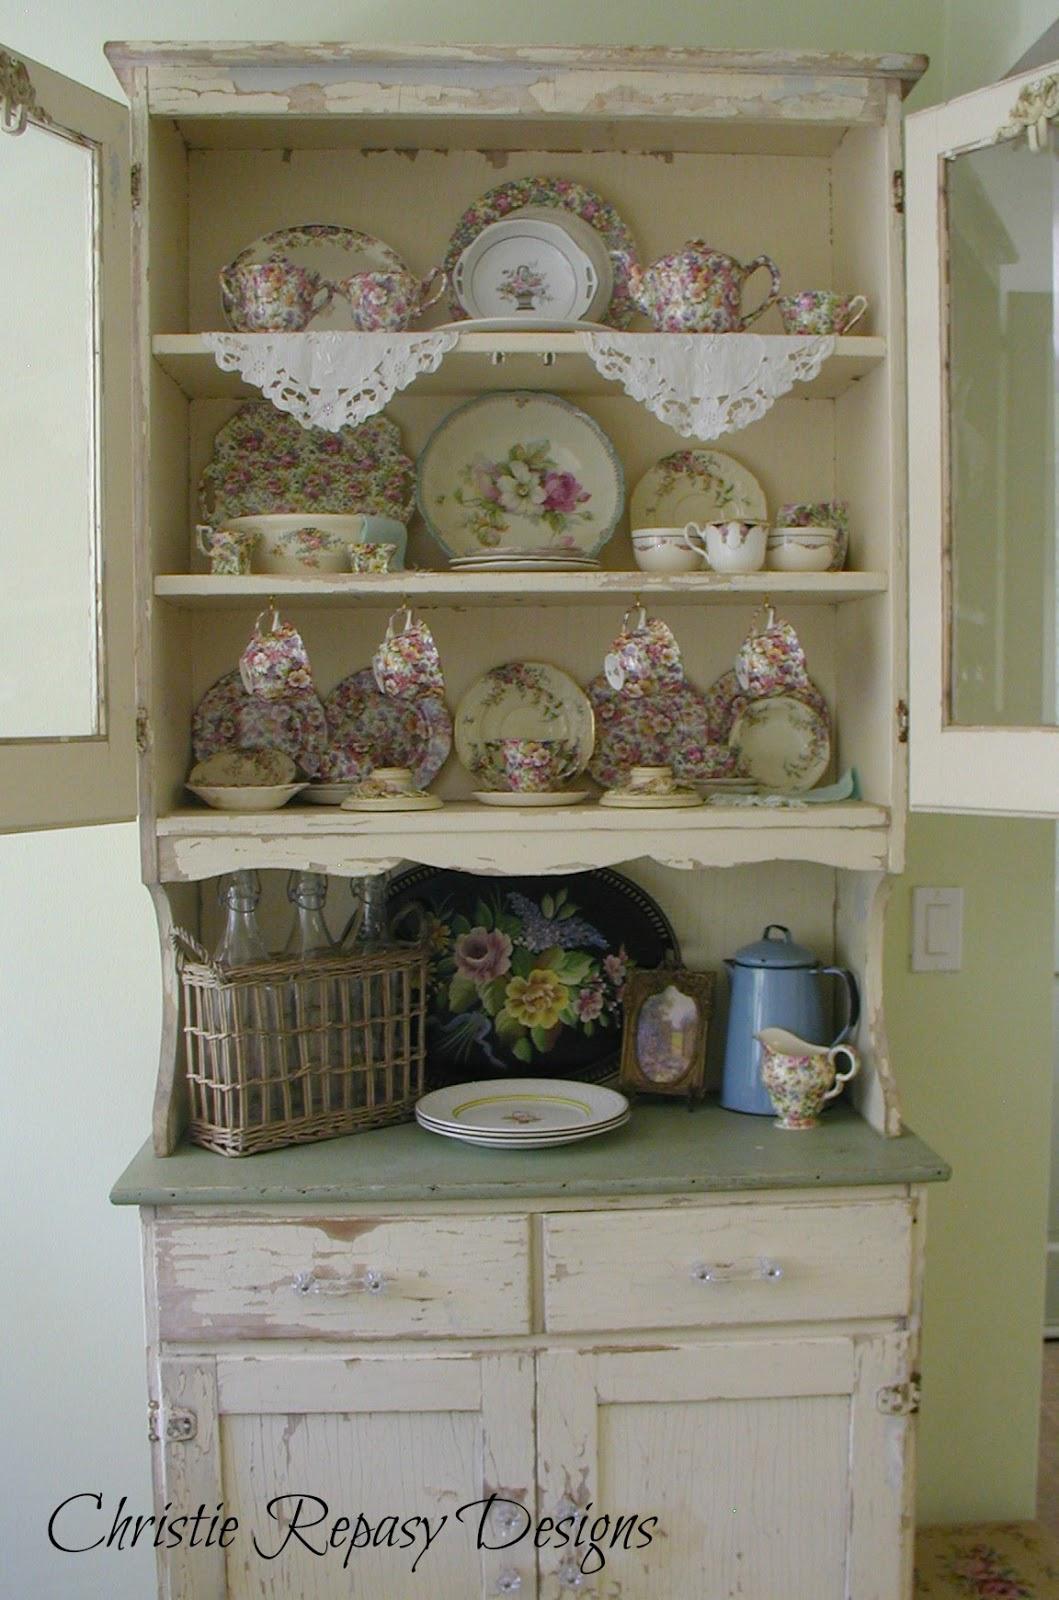 chateau de fleurs my little country kitchen. Black Bedroom Furniture Sets. Home Design Ideas